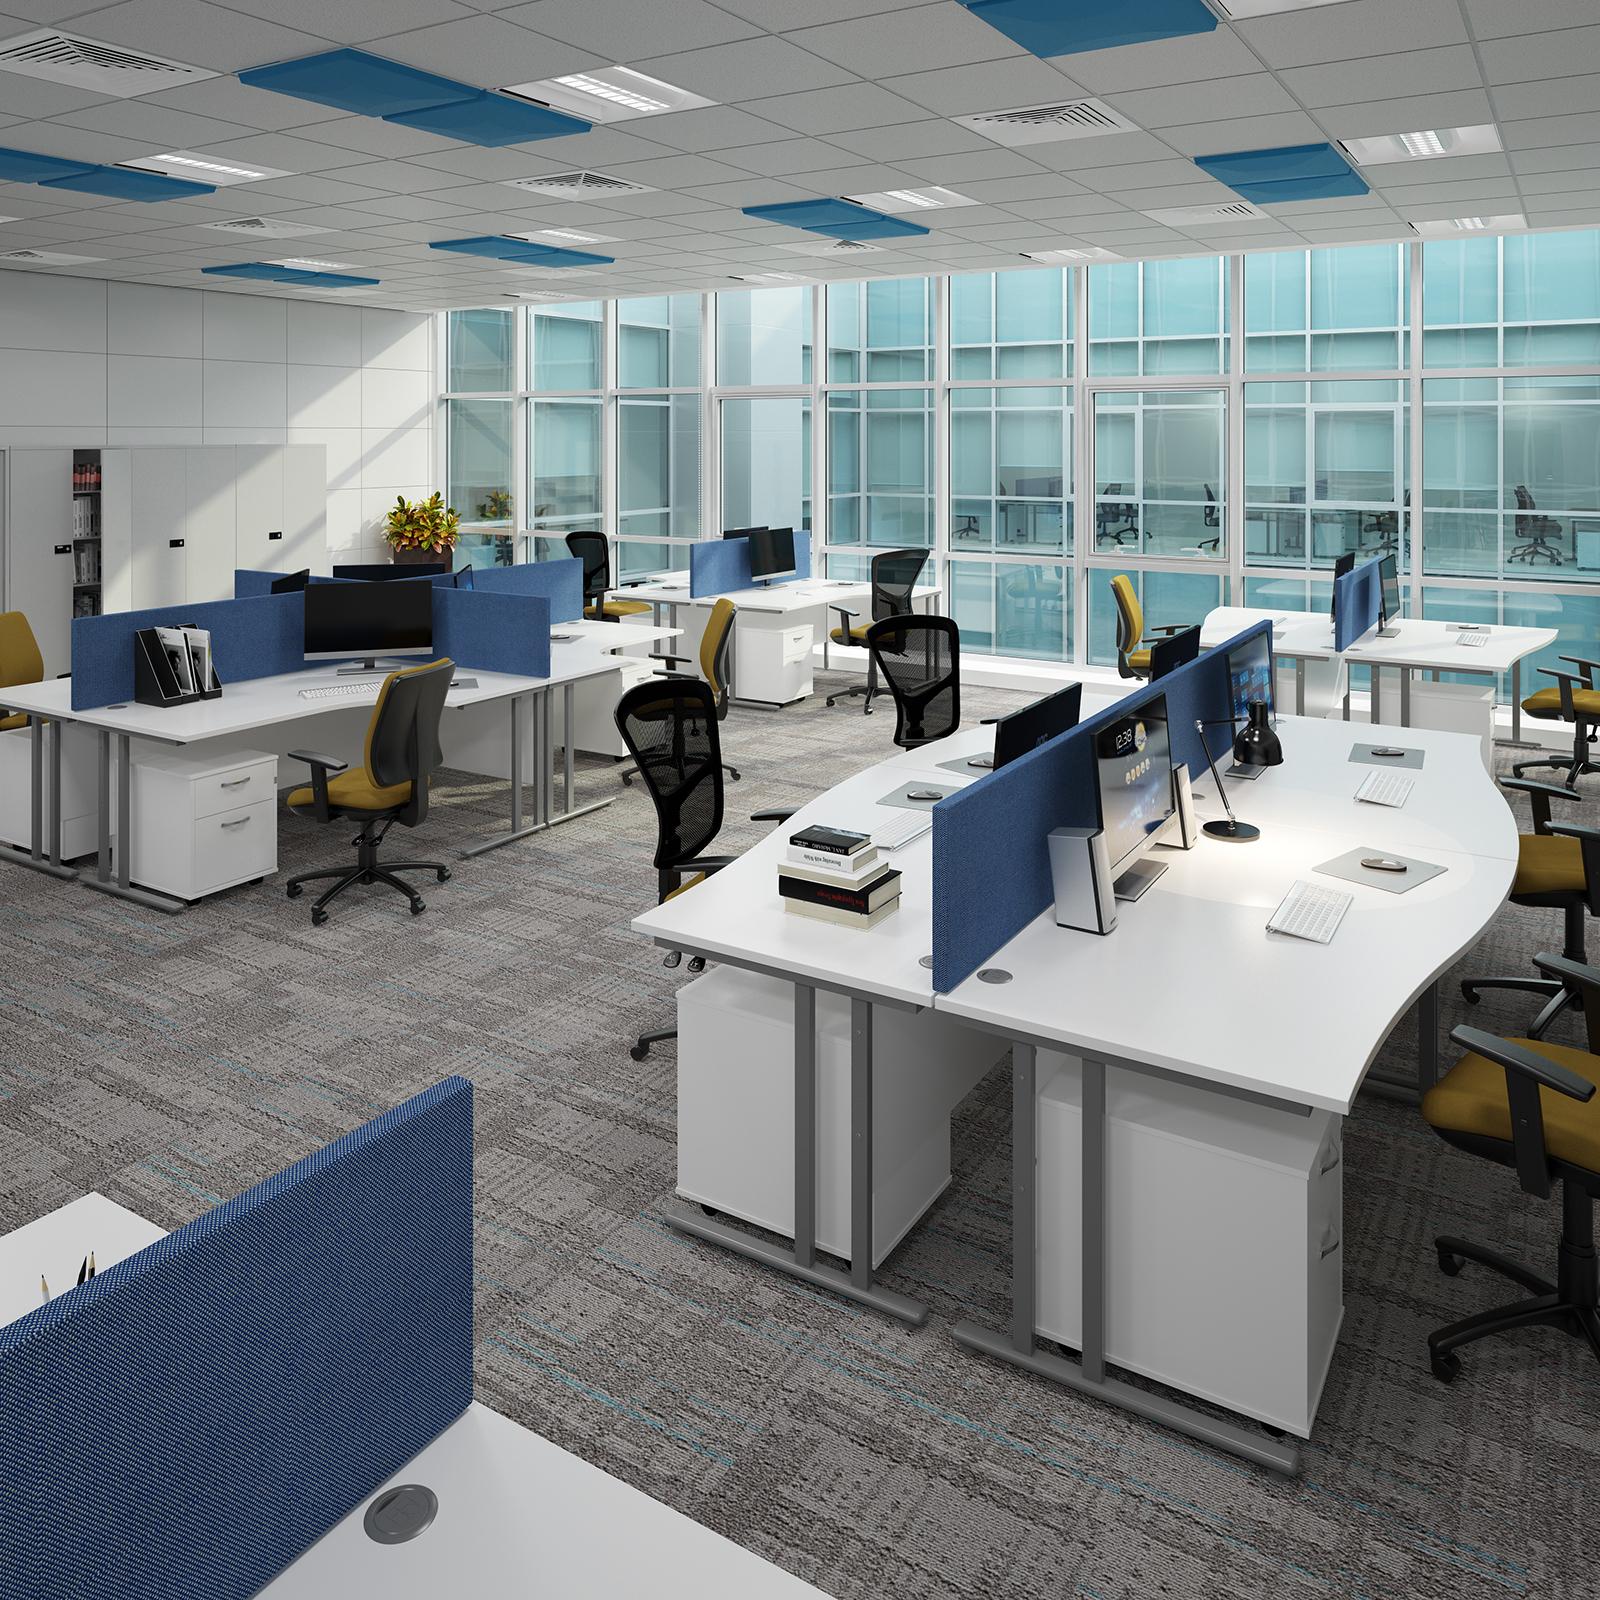 office world desks. Image Office World Desks R